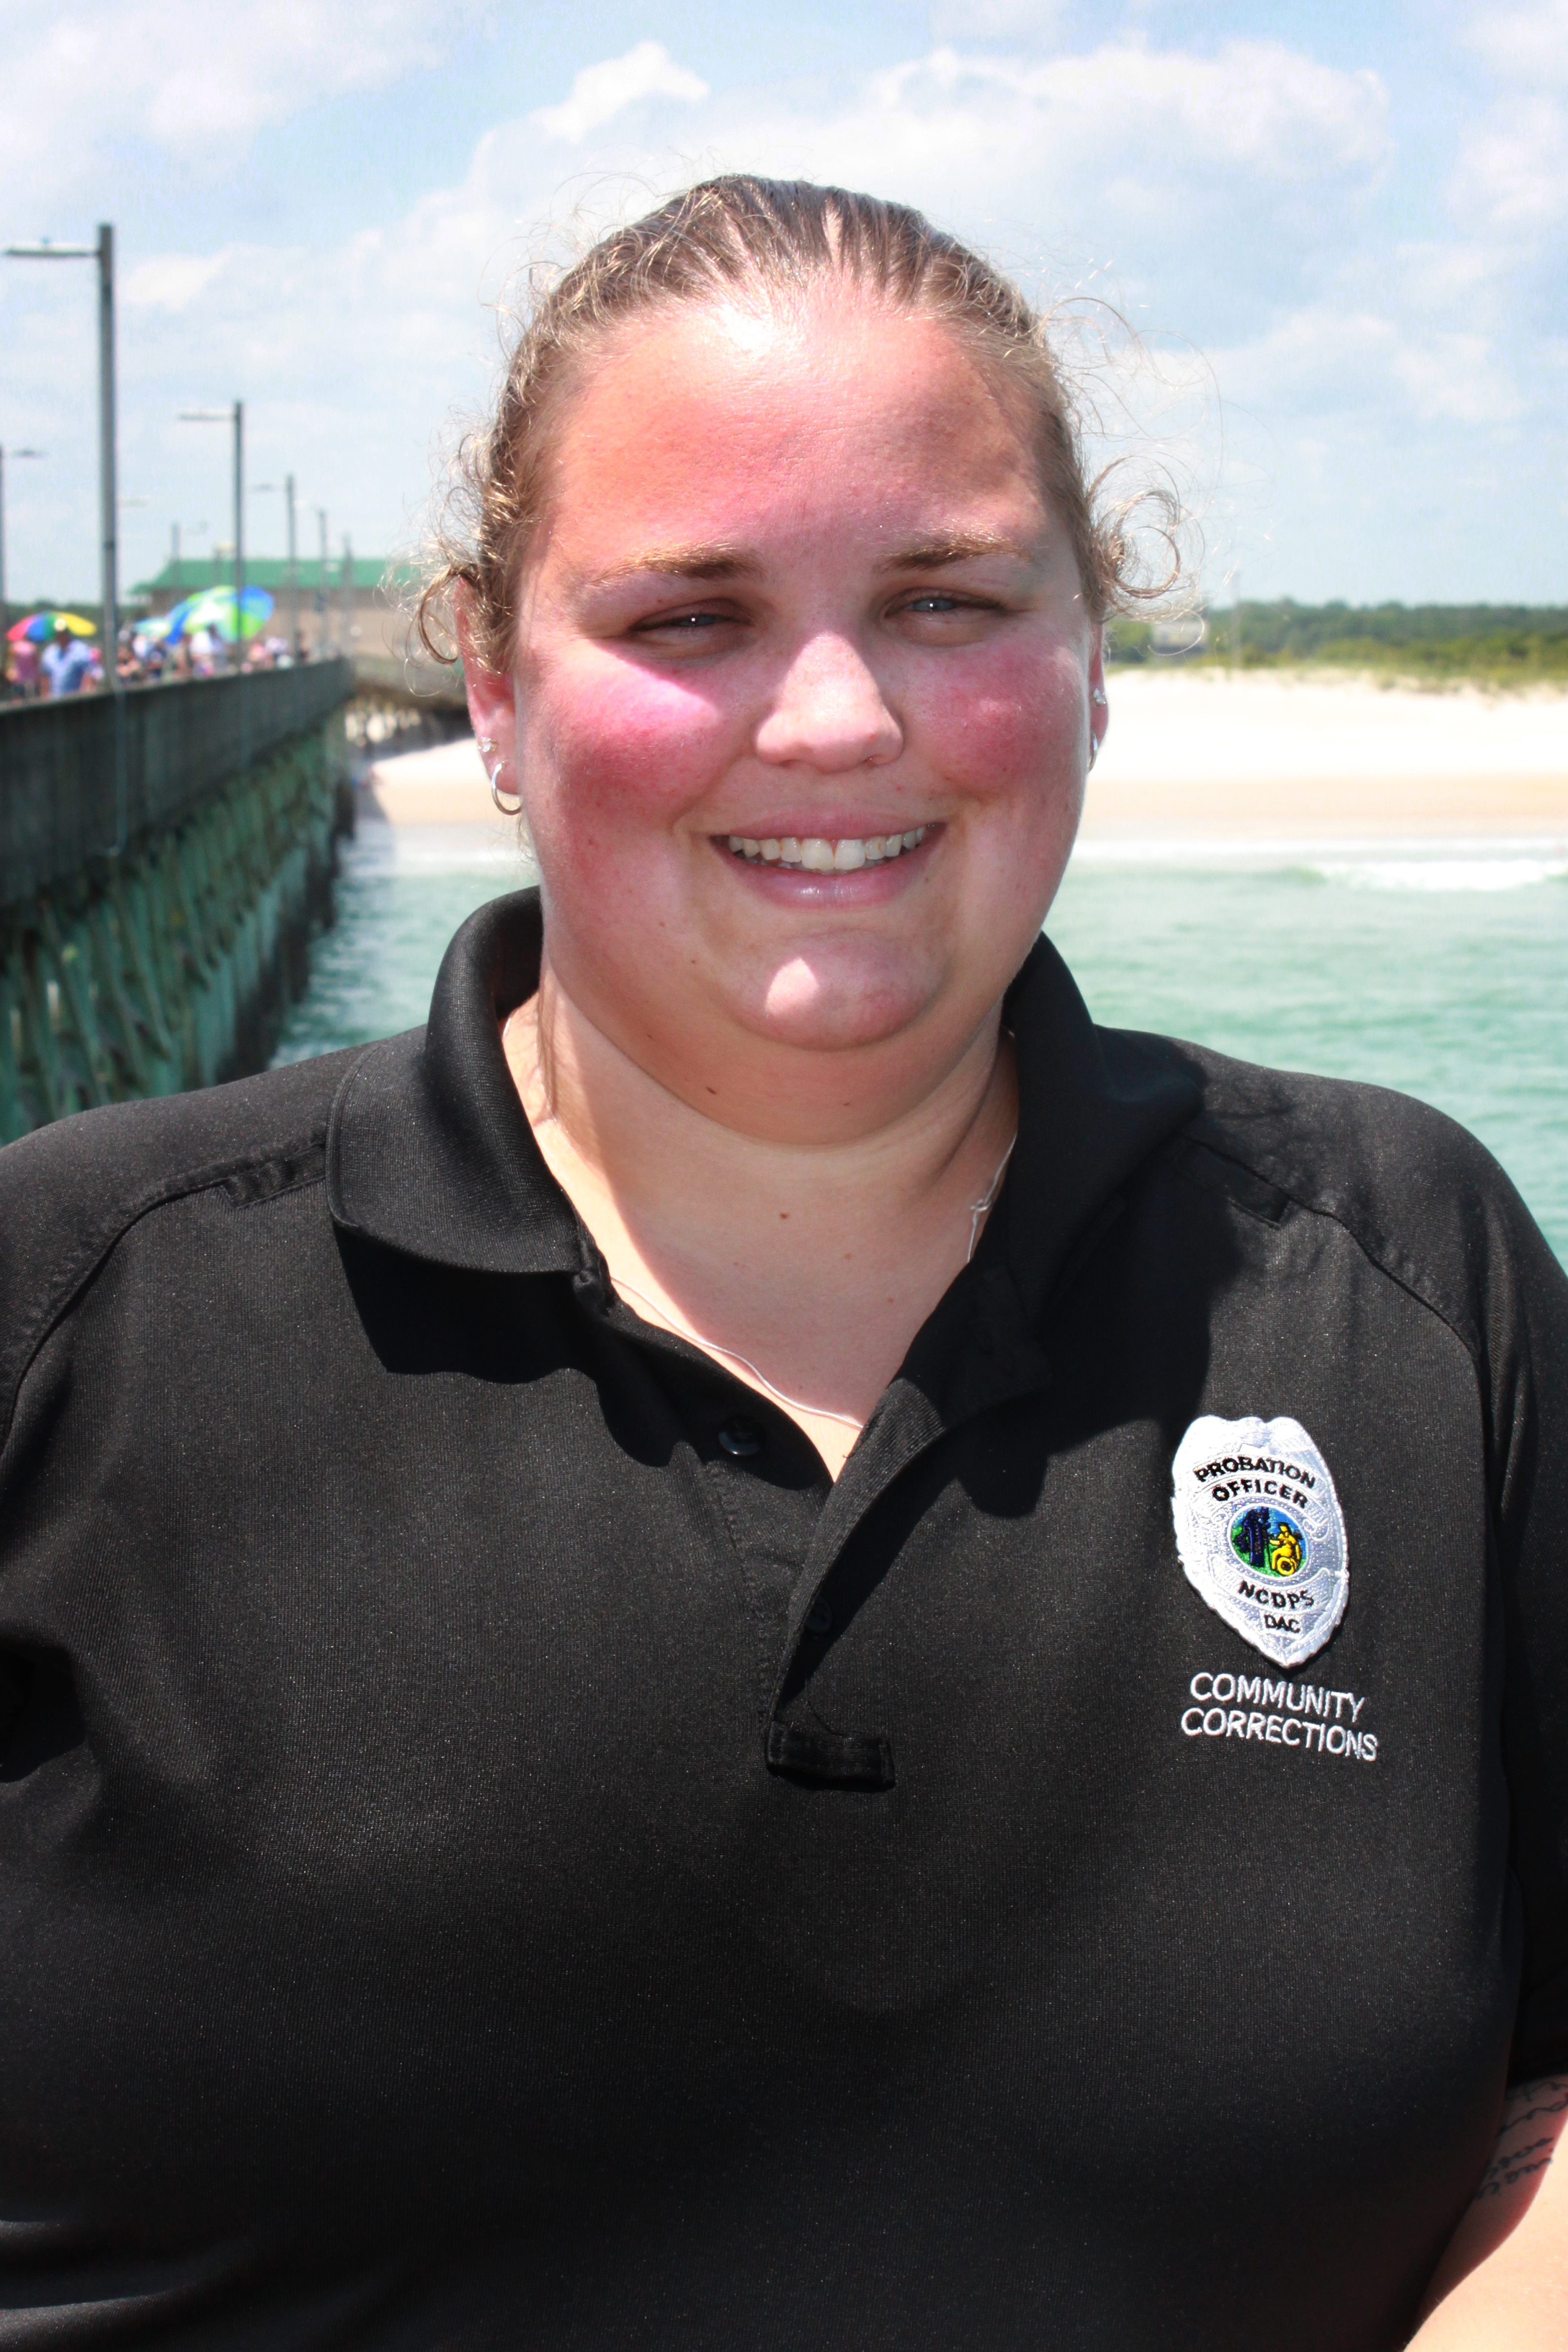 Megan Kathleen Hess